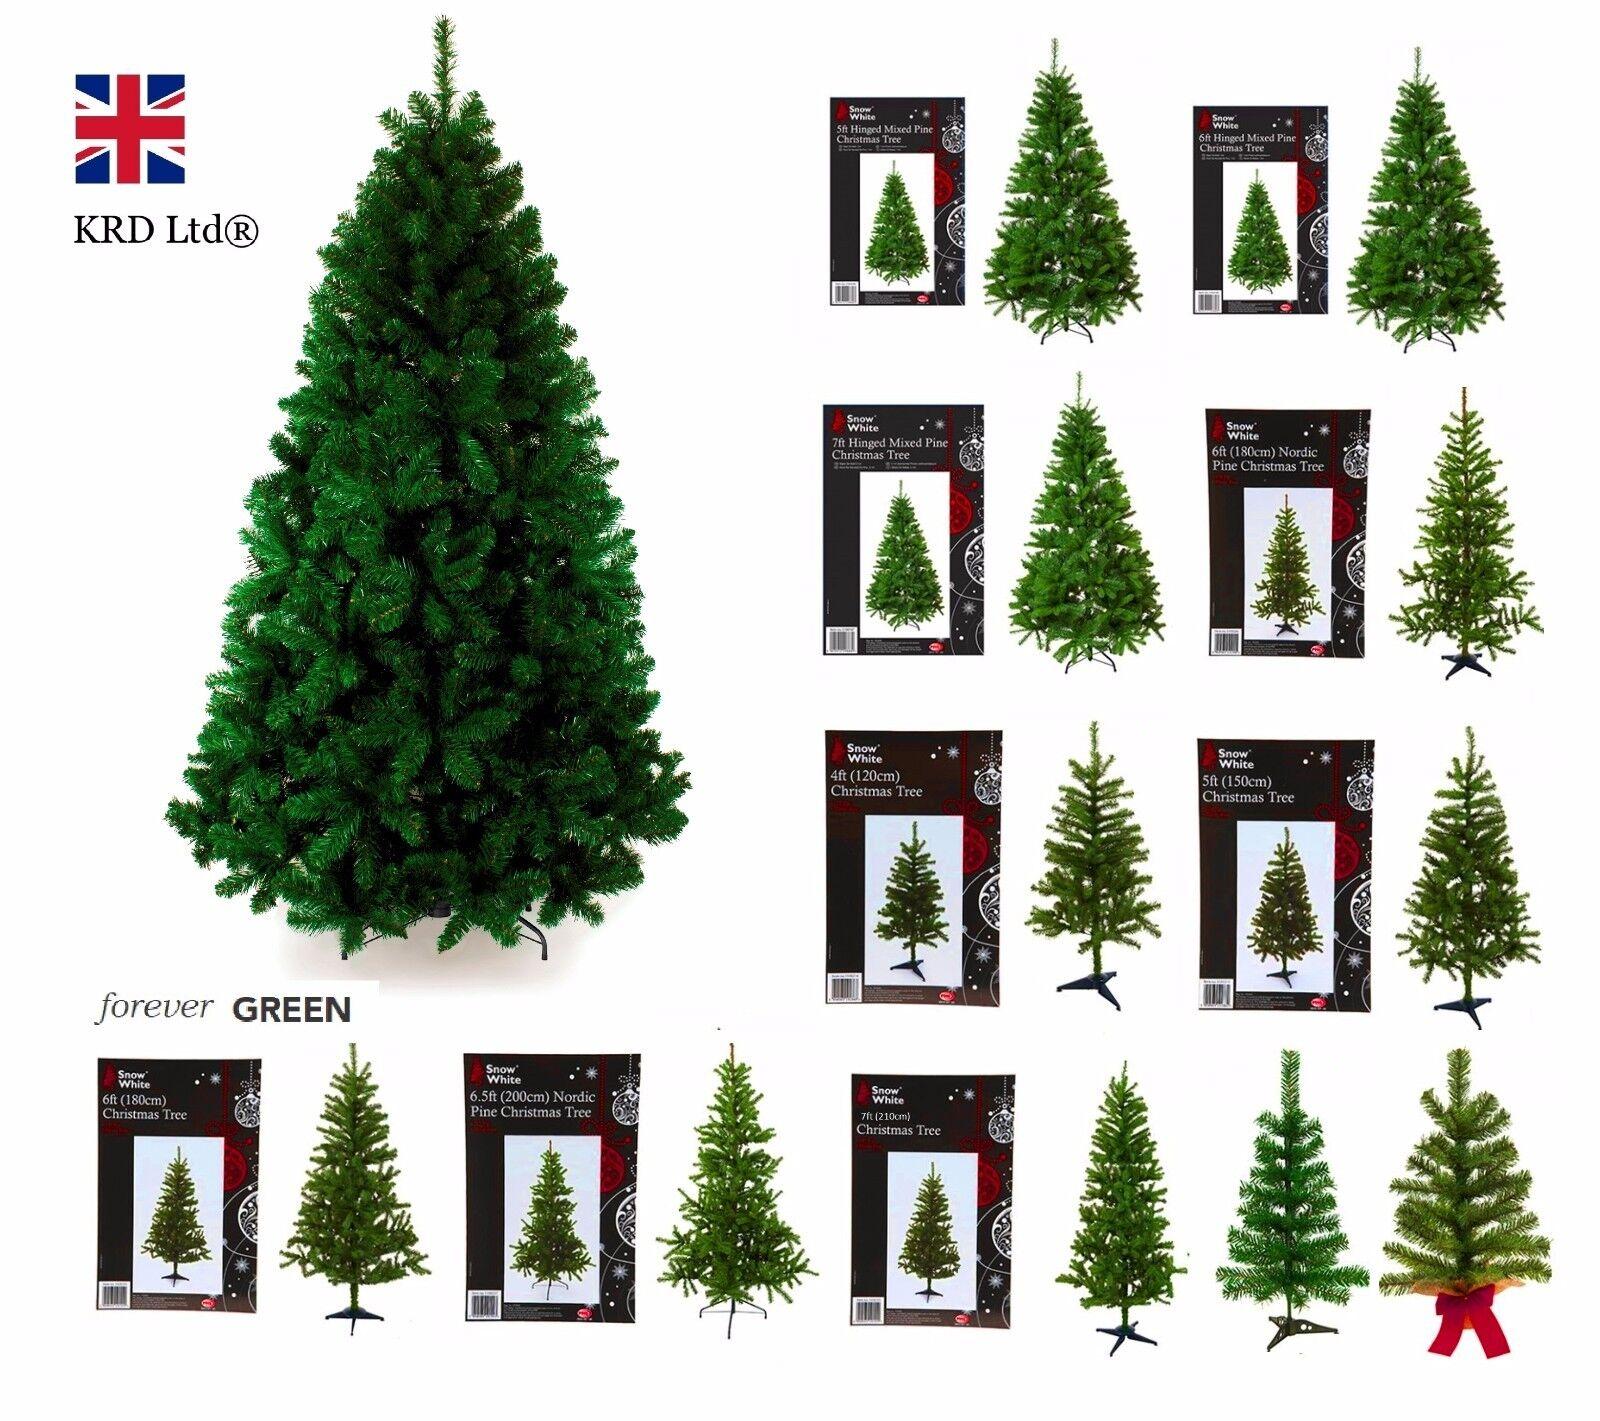 Artificiel sapin de no l premium pin design traditionnel vert for t cadeau no l ebay - Sapin de noel traditionnel ...